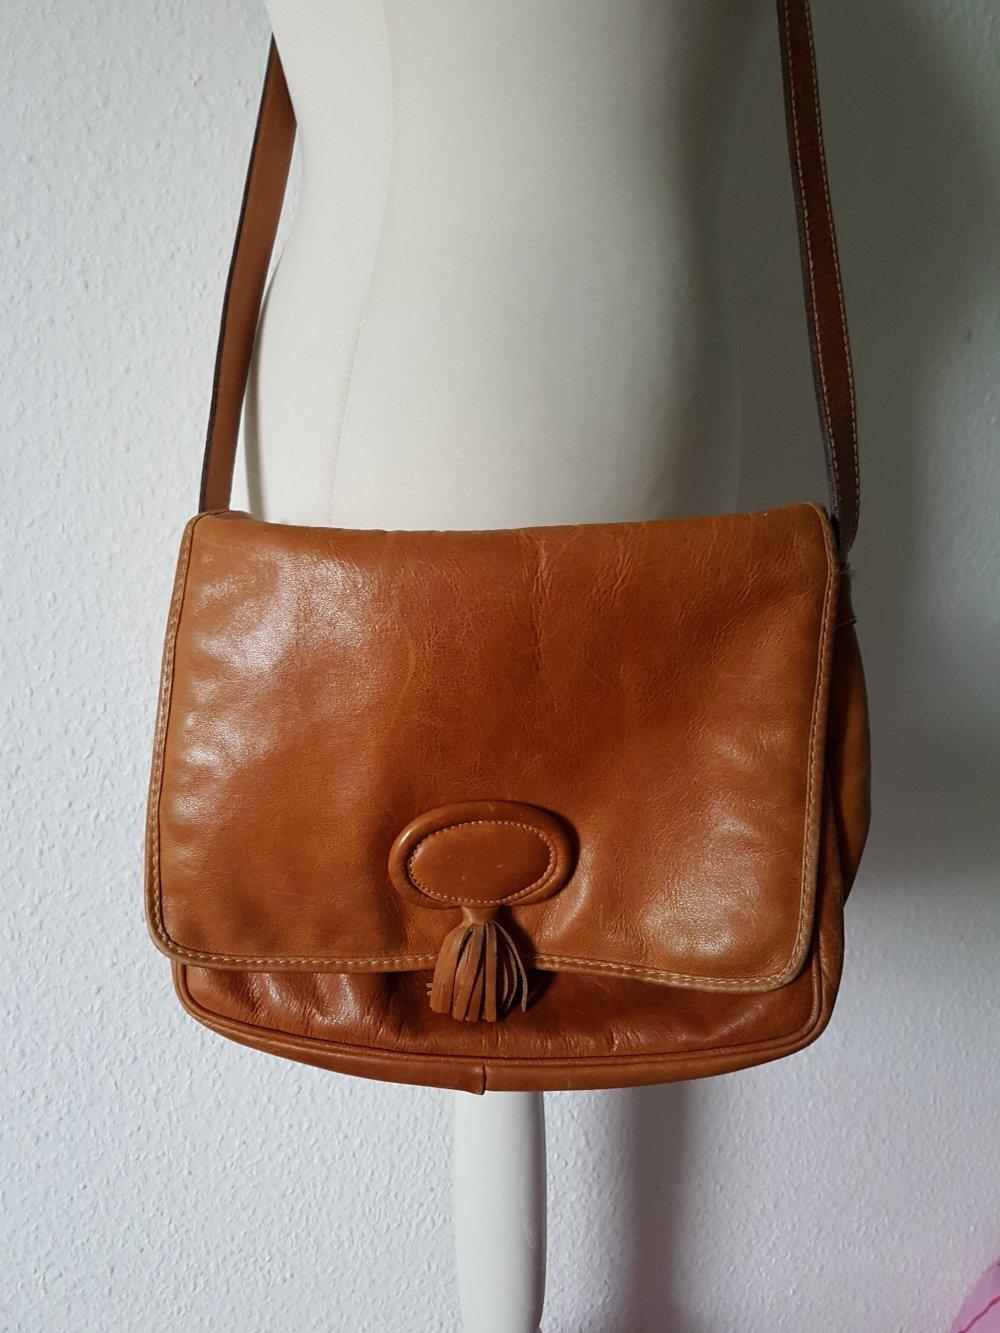 3cacc4efdee4a Braune Ledertasche vintage    Kleiderkorb.de